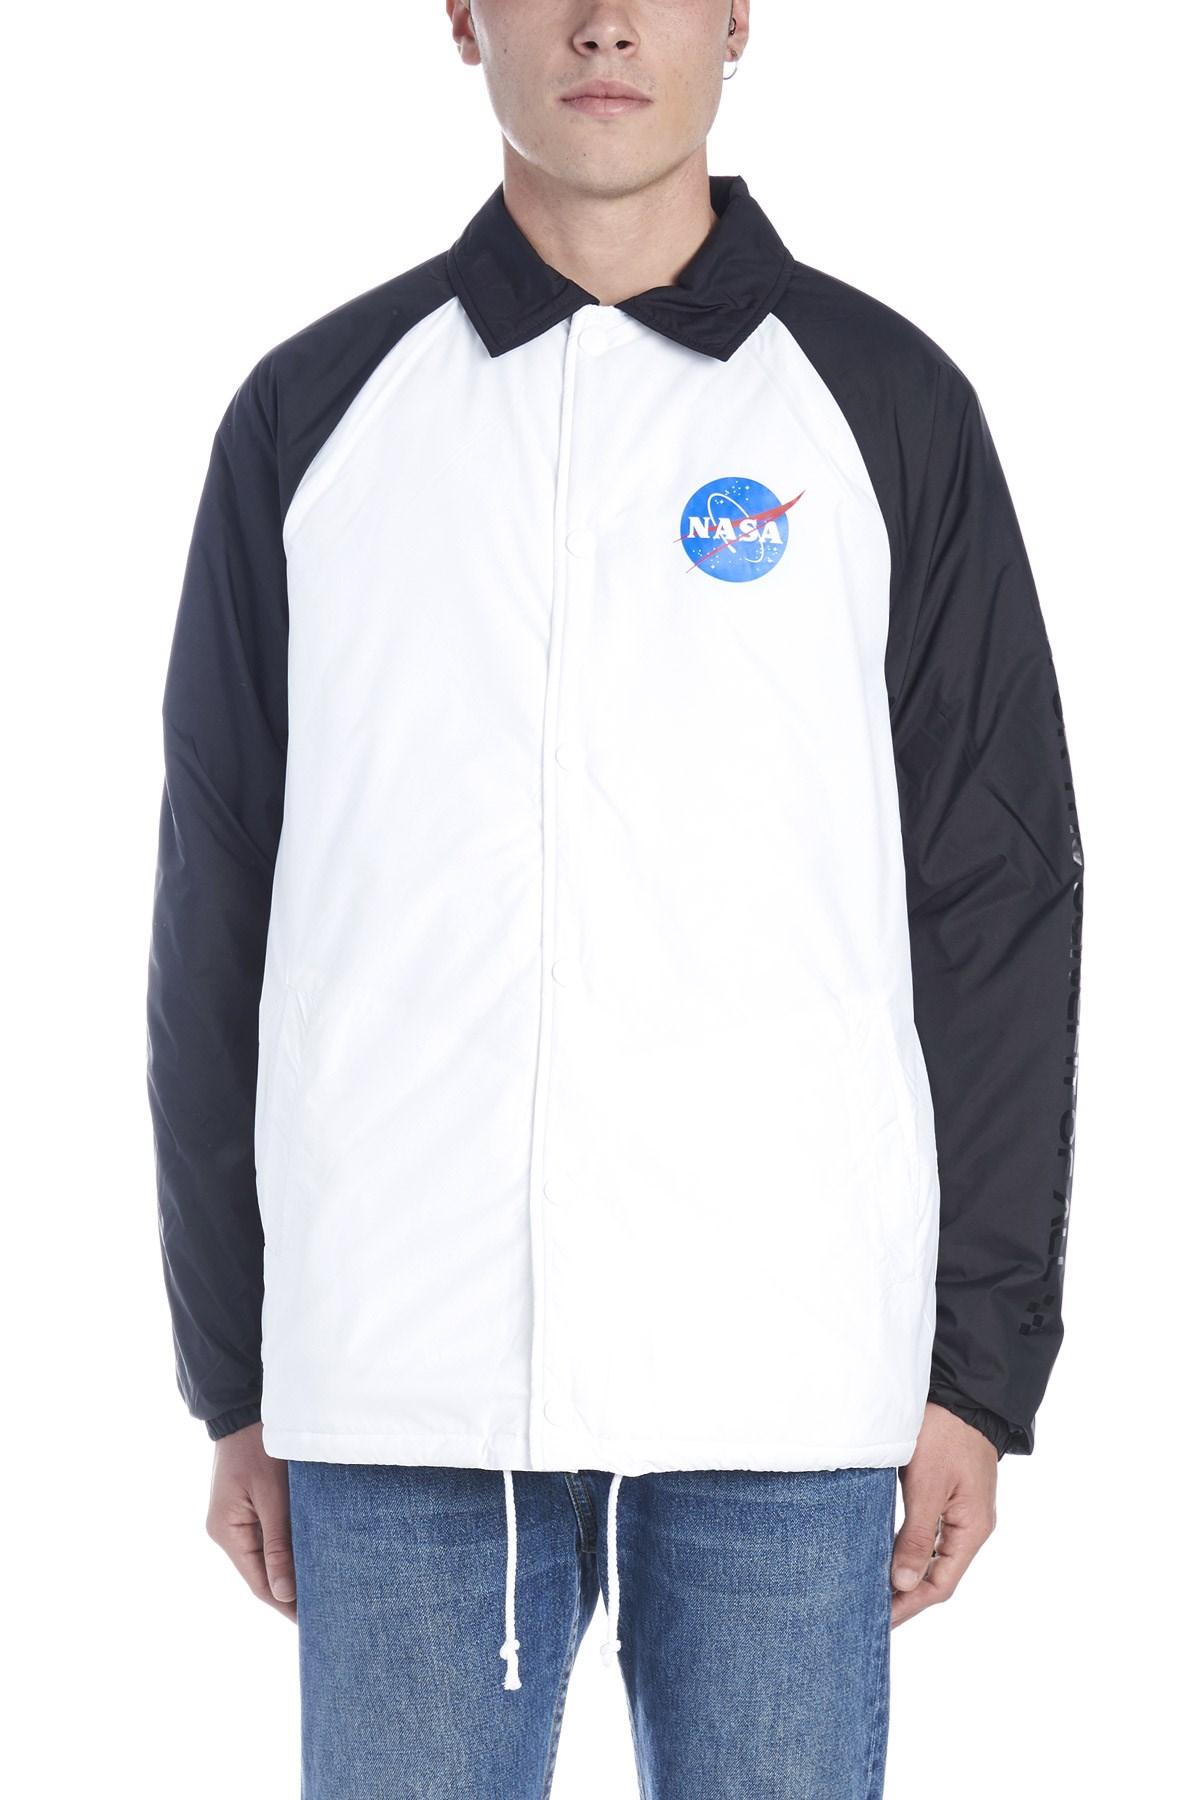 Vans Nasa Jacket Available On Julian Fashion Com 60545